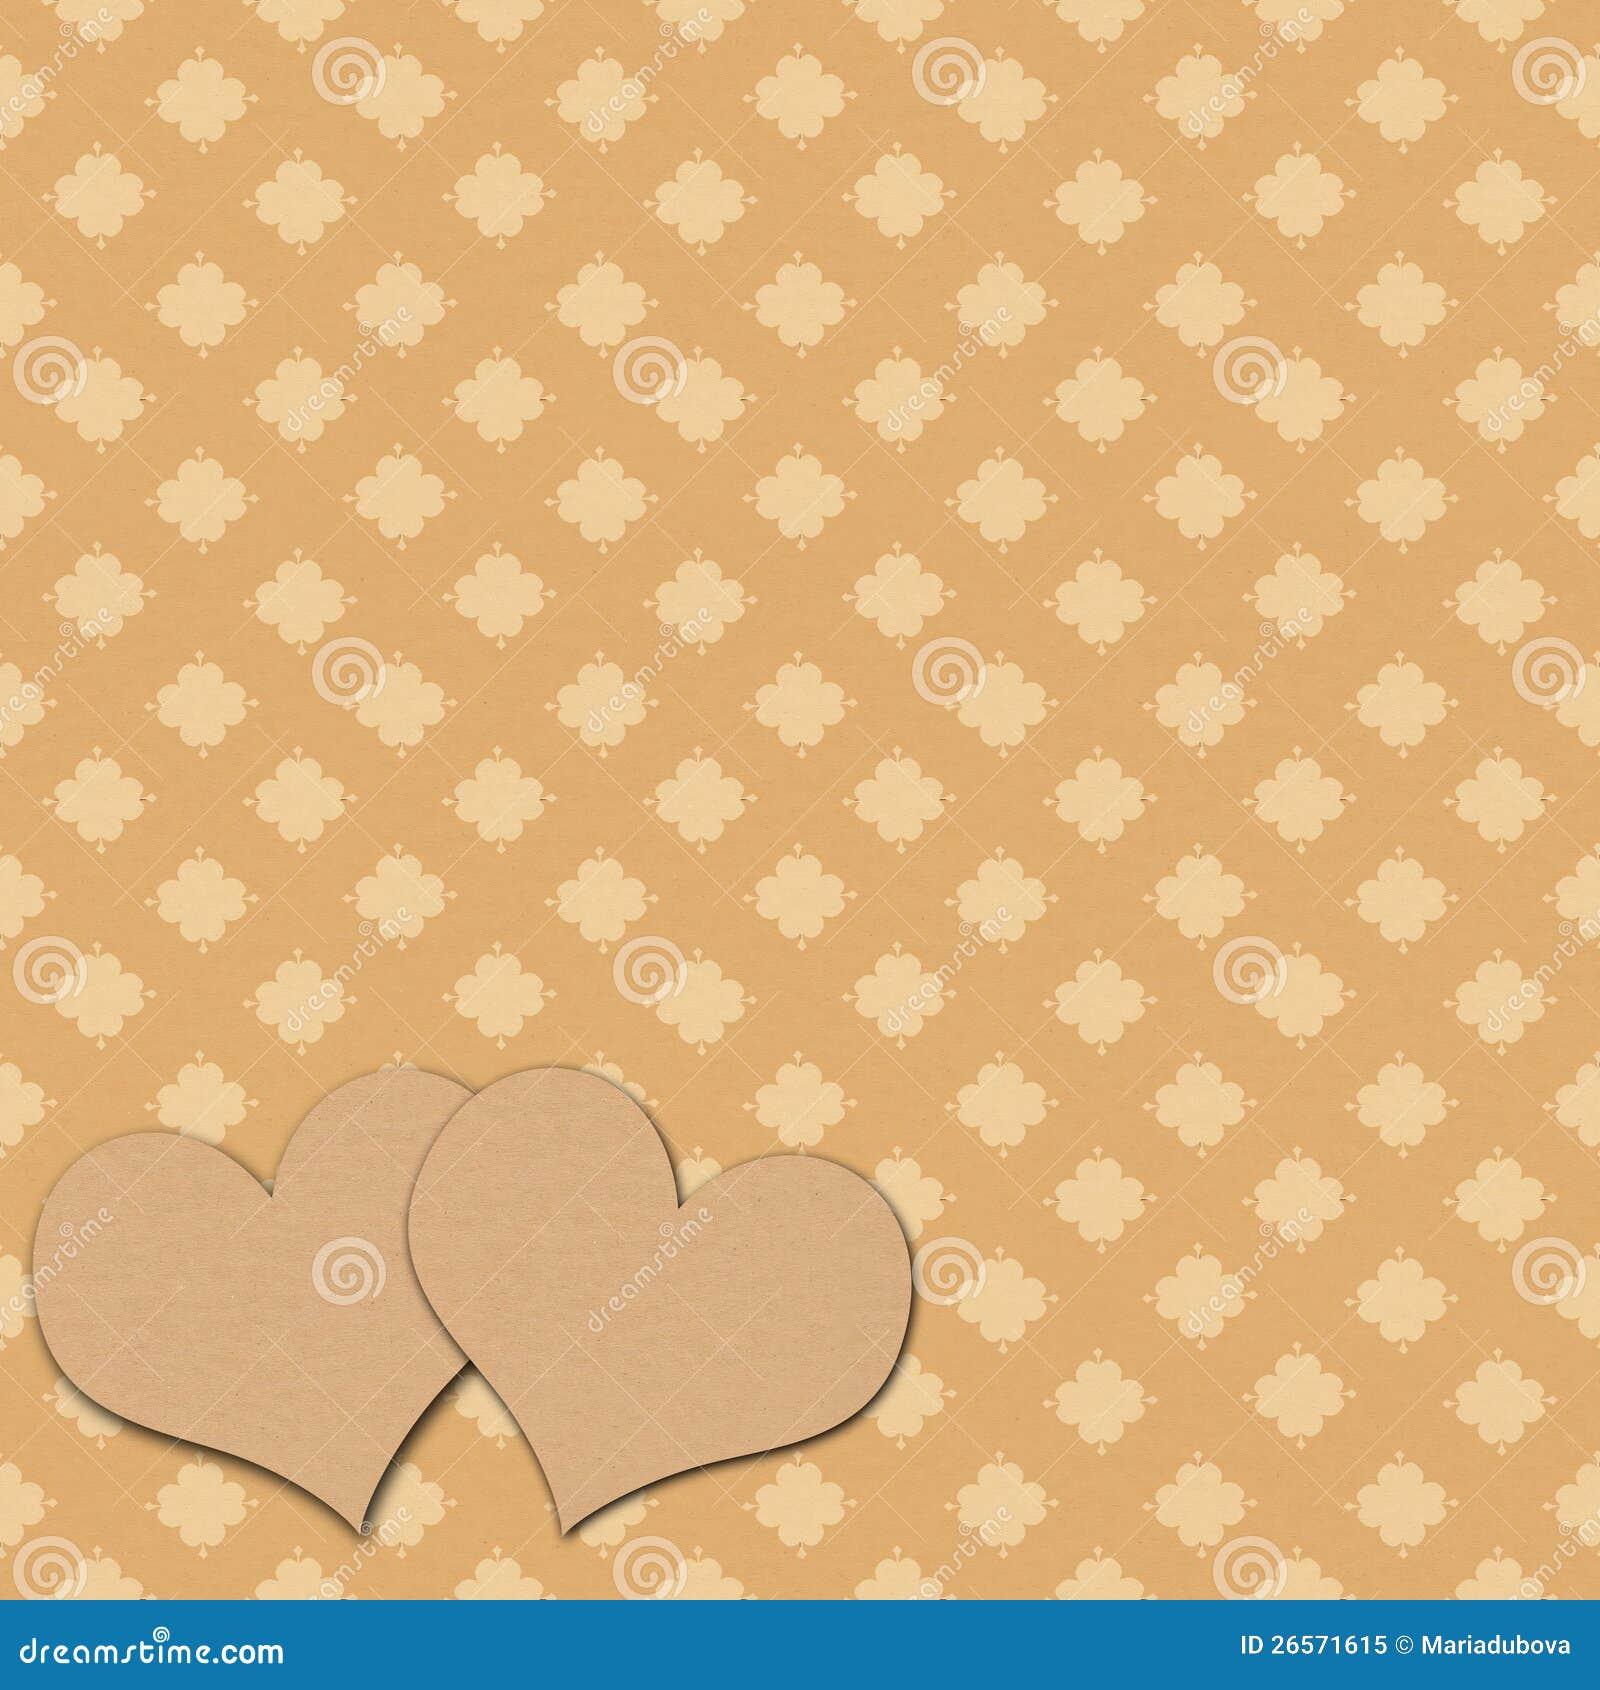 Vintage Heart Background Vintage Heart Backgrou...